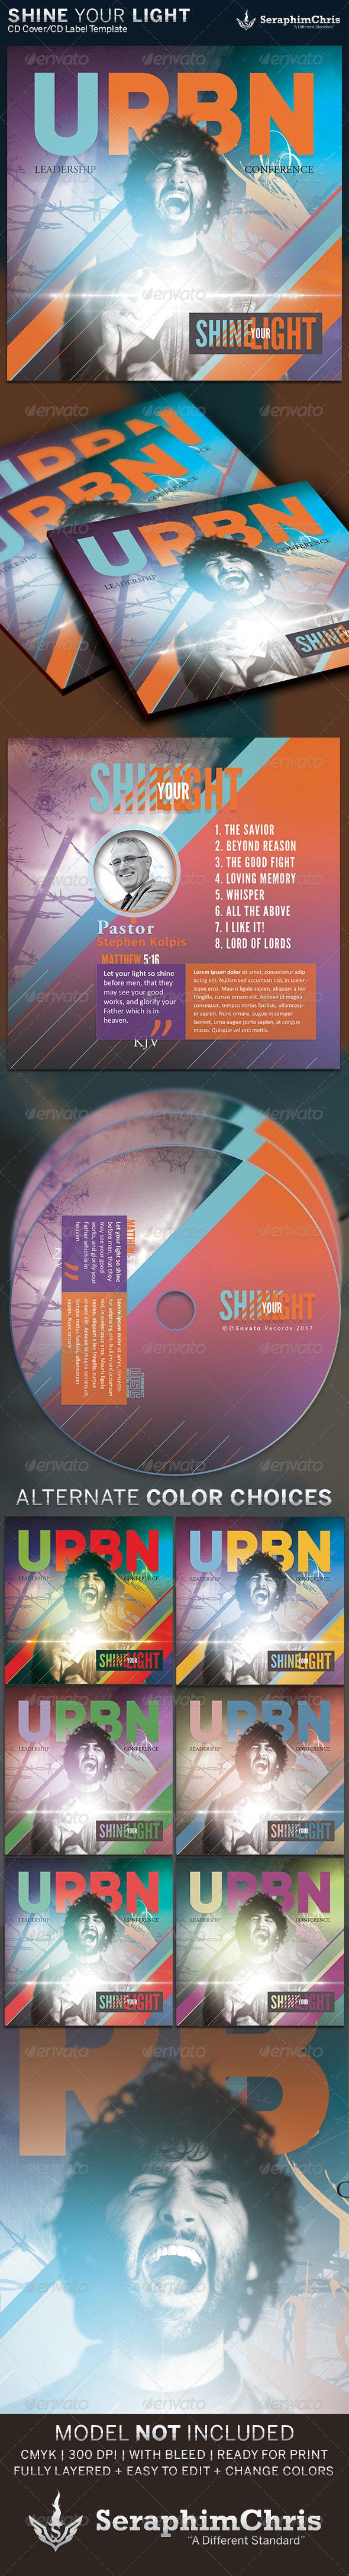 Shine Your Light: CD Cover Artwork Template - CD & DVD Artwork Print Templates